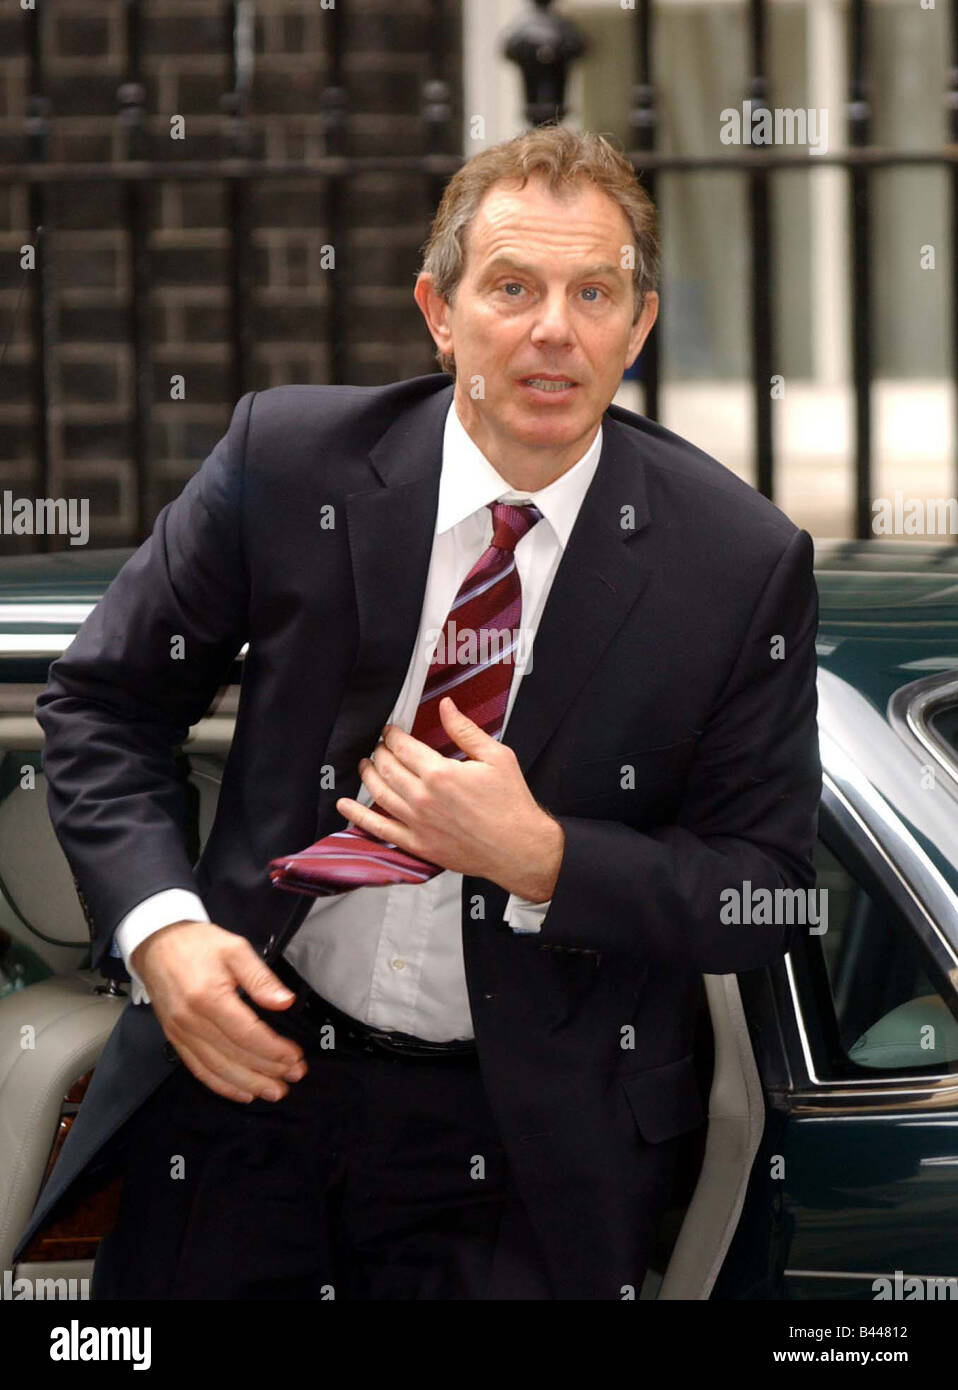 Tony Blair returns to No 10 from Sandhurst April 2003 - Stock Image